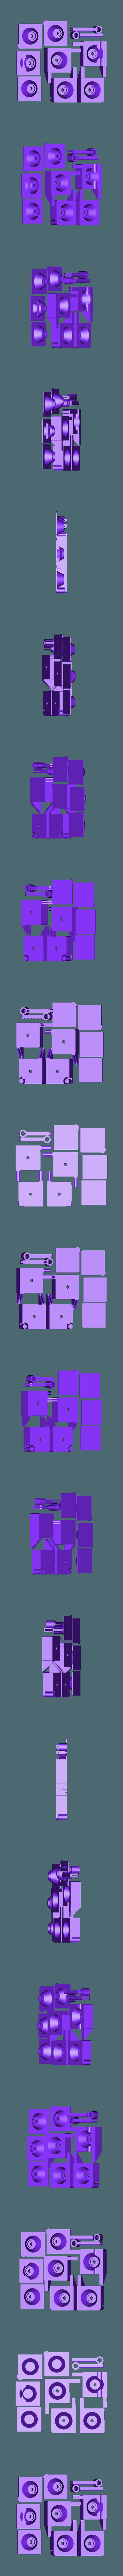 Prusa_Enclosure_Bottom Corners.stl Download free STL file Original Prusa i3 MK3 ENCLOSURE -Ikea Lack table - Prusa Research • Template to 3D print, cisardom